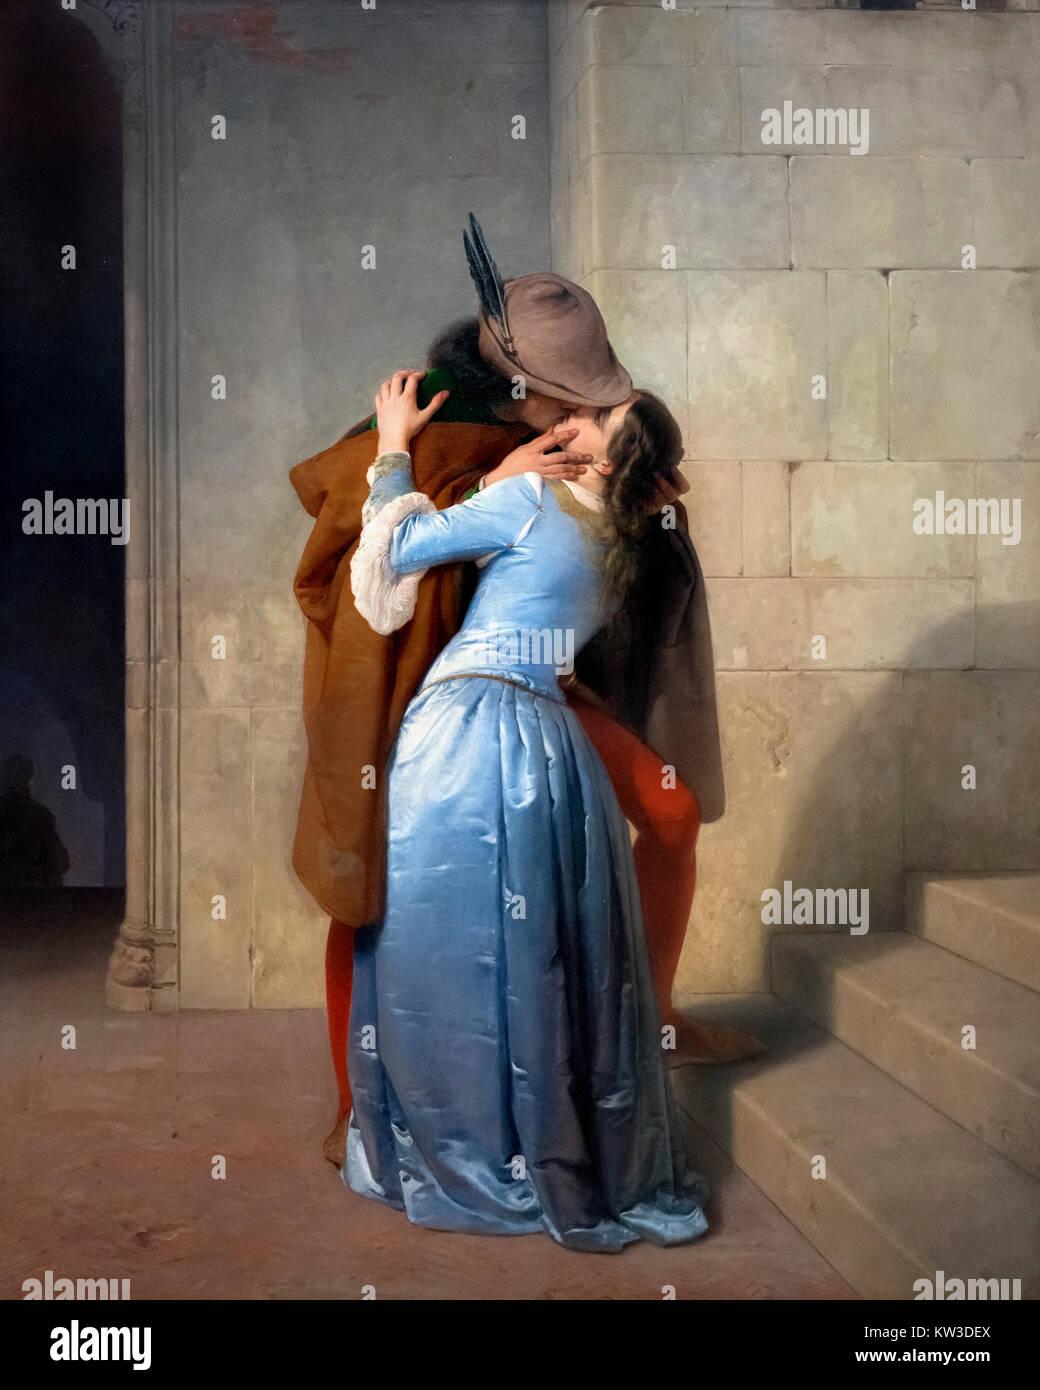 Der Kuss (Il Bacio) von Francesco Hayez (1791-1882), Öl auf Leinwand, 1859 Stockbild